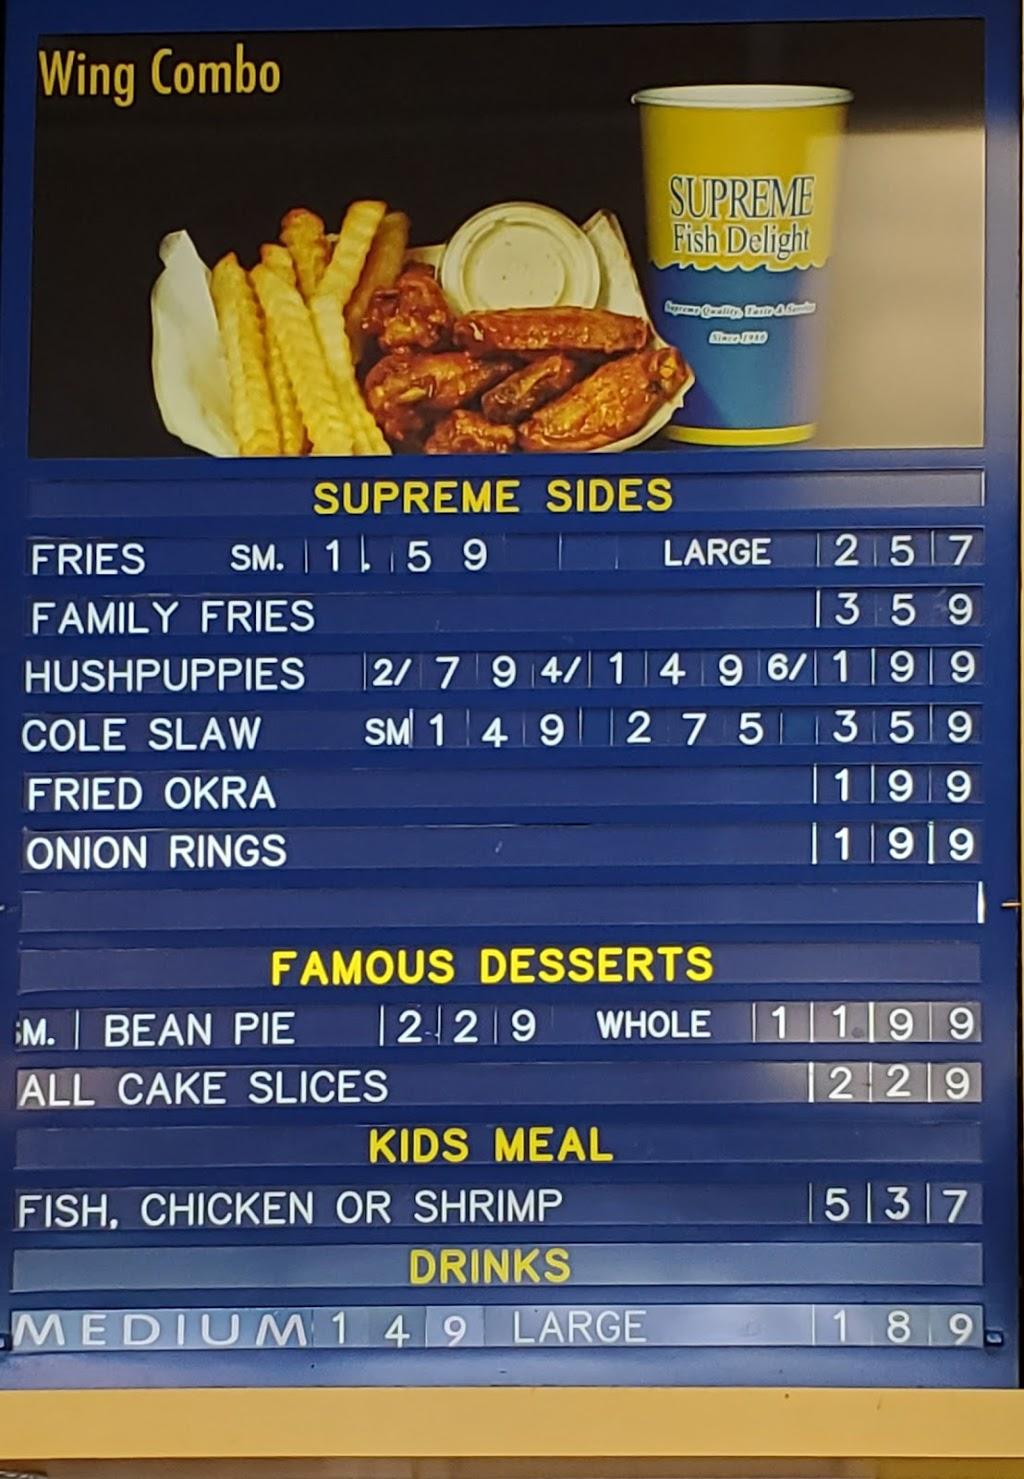 Supreme Fish Delight - restaurant  | Photo 7 of 10 | Address: 3037 Panola Rd, Stonecrest, GA 30038, USA | Phone: (770) 987-3242